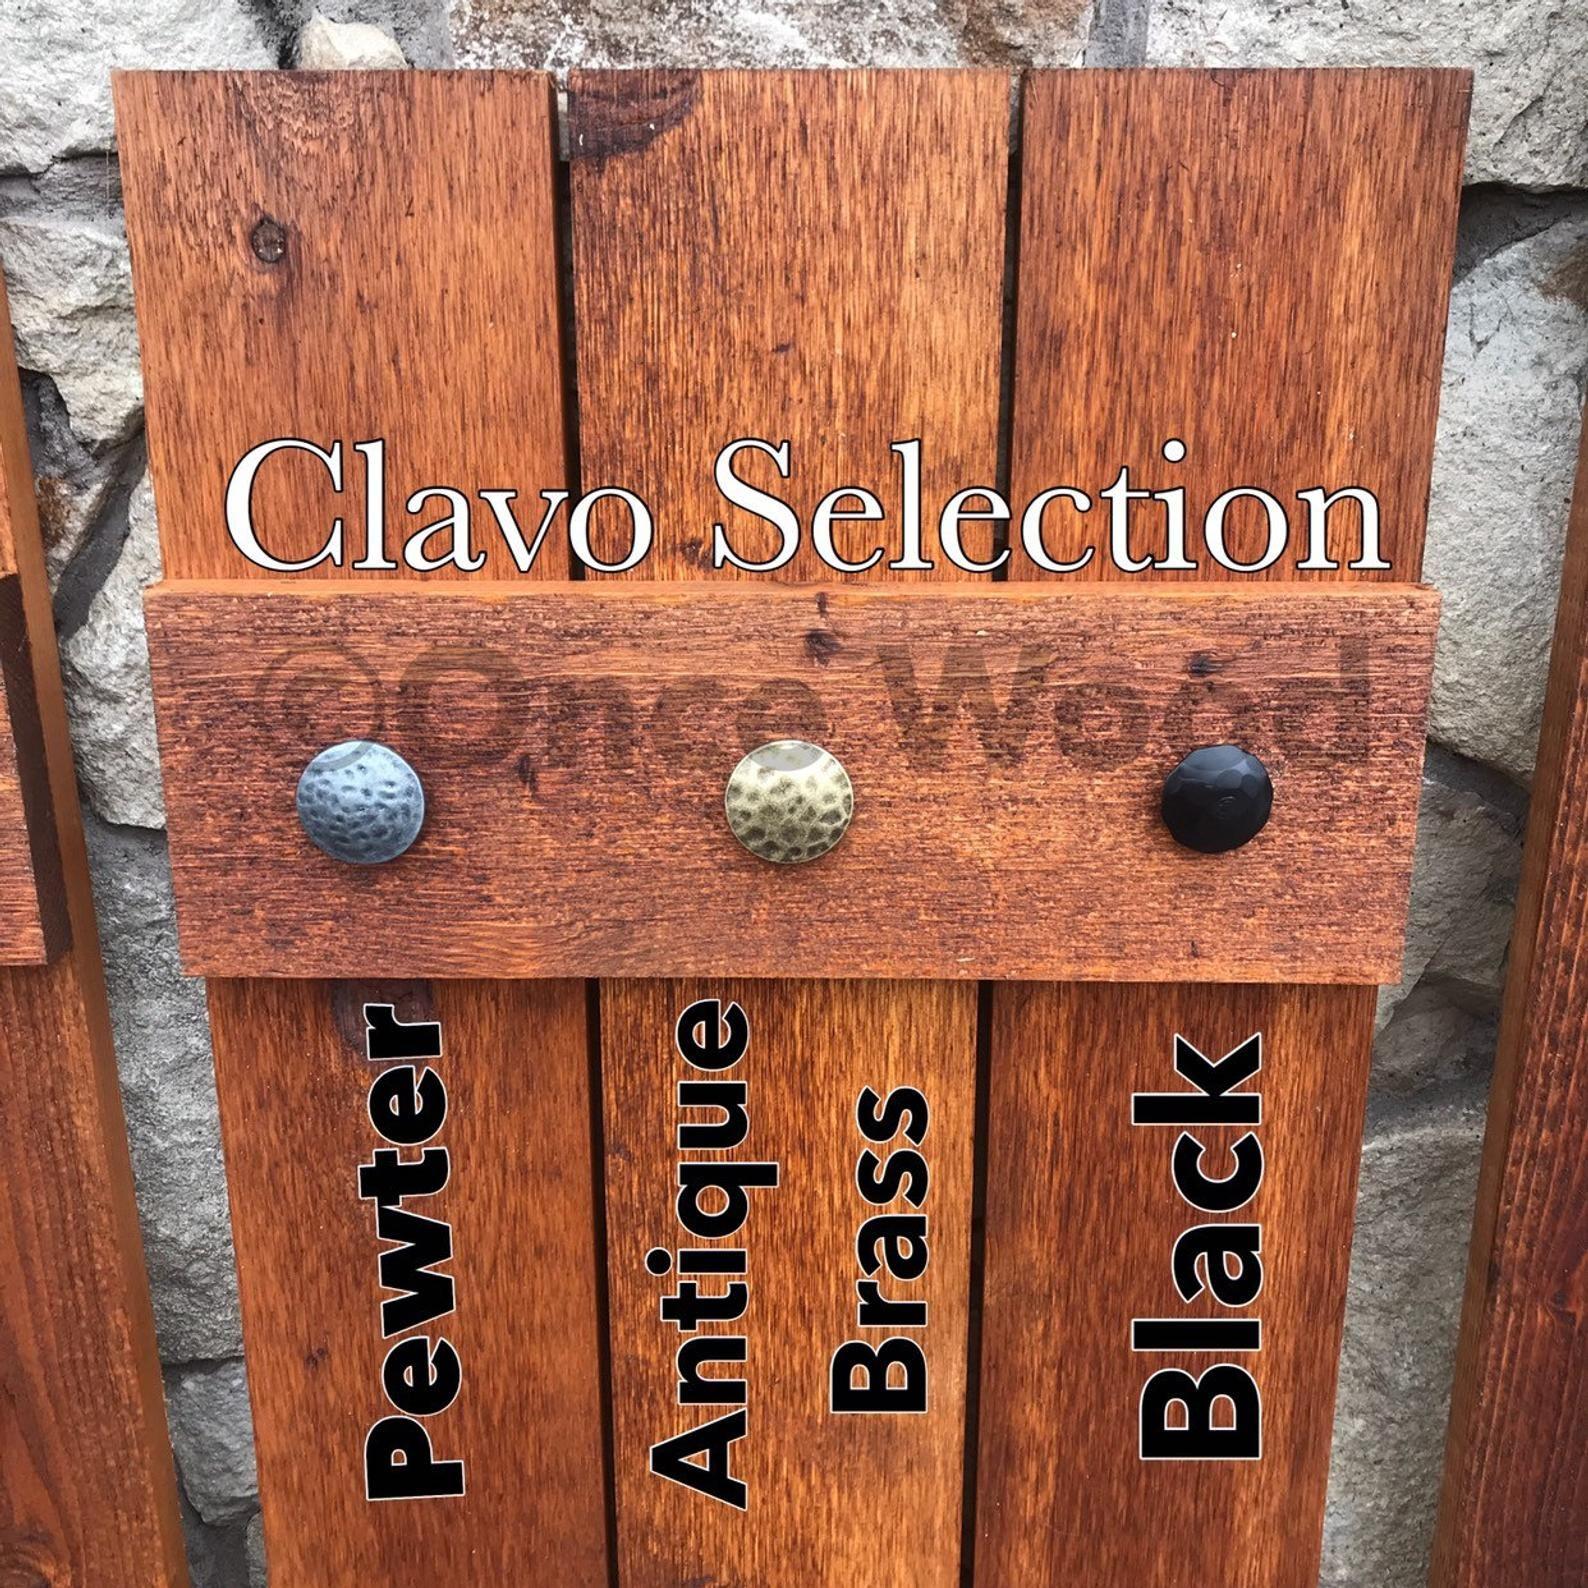 Antique clavos for 3 board 2 batten shutters cedar shutter